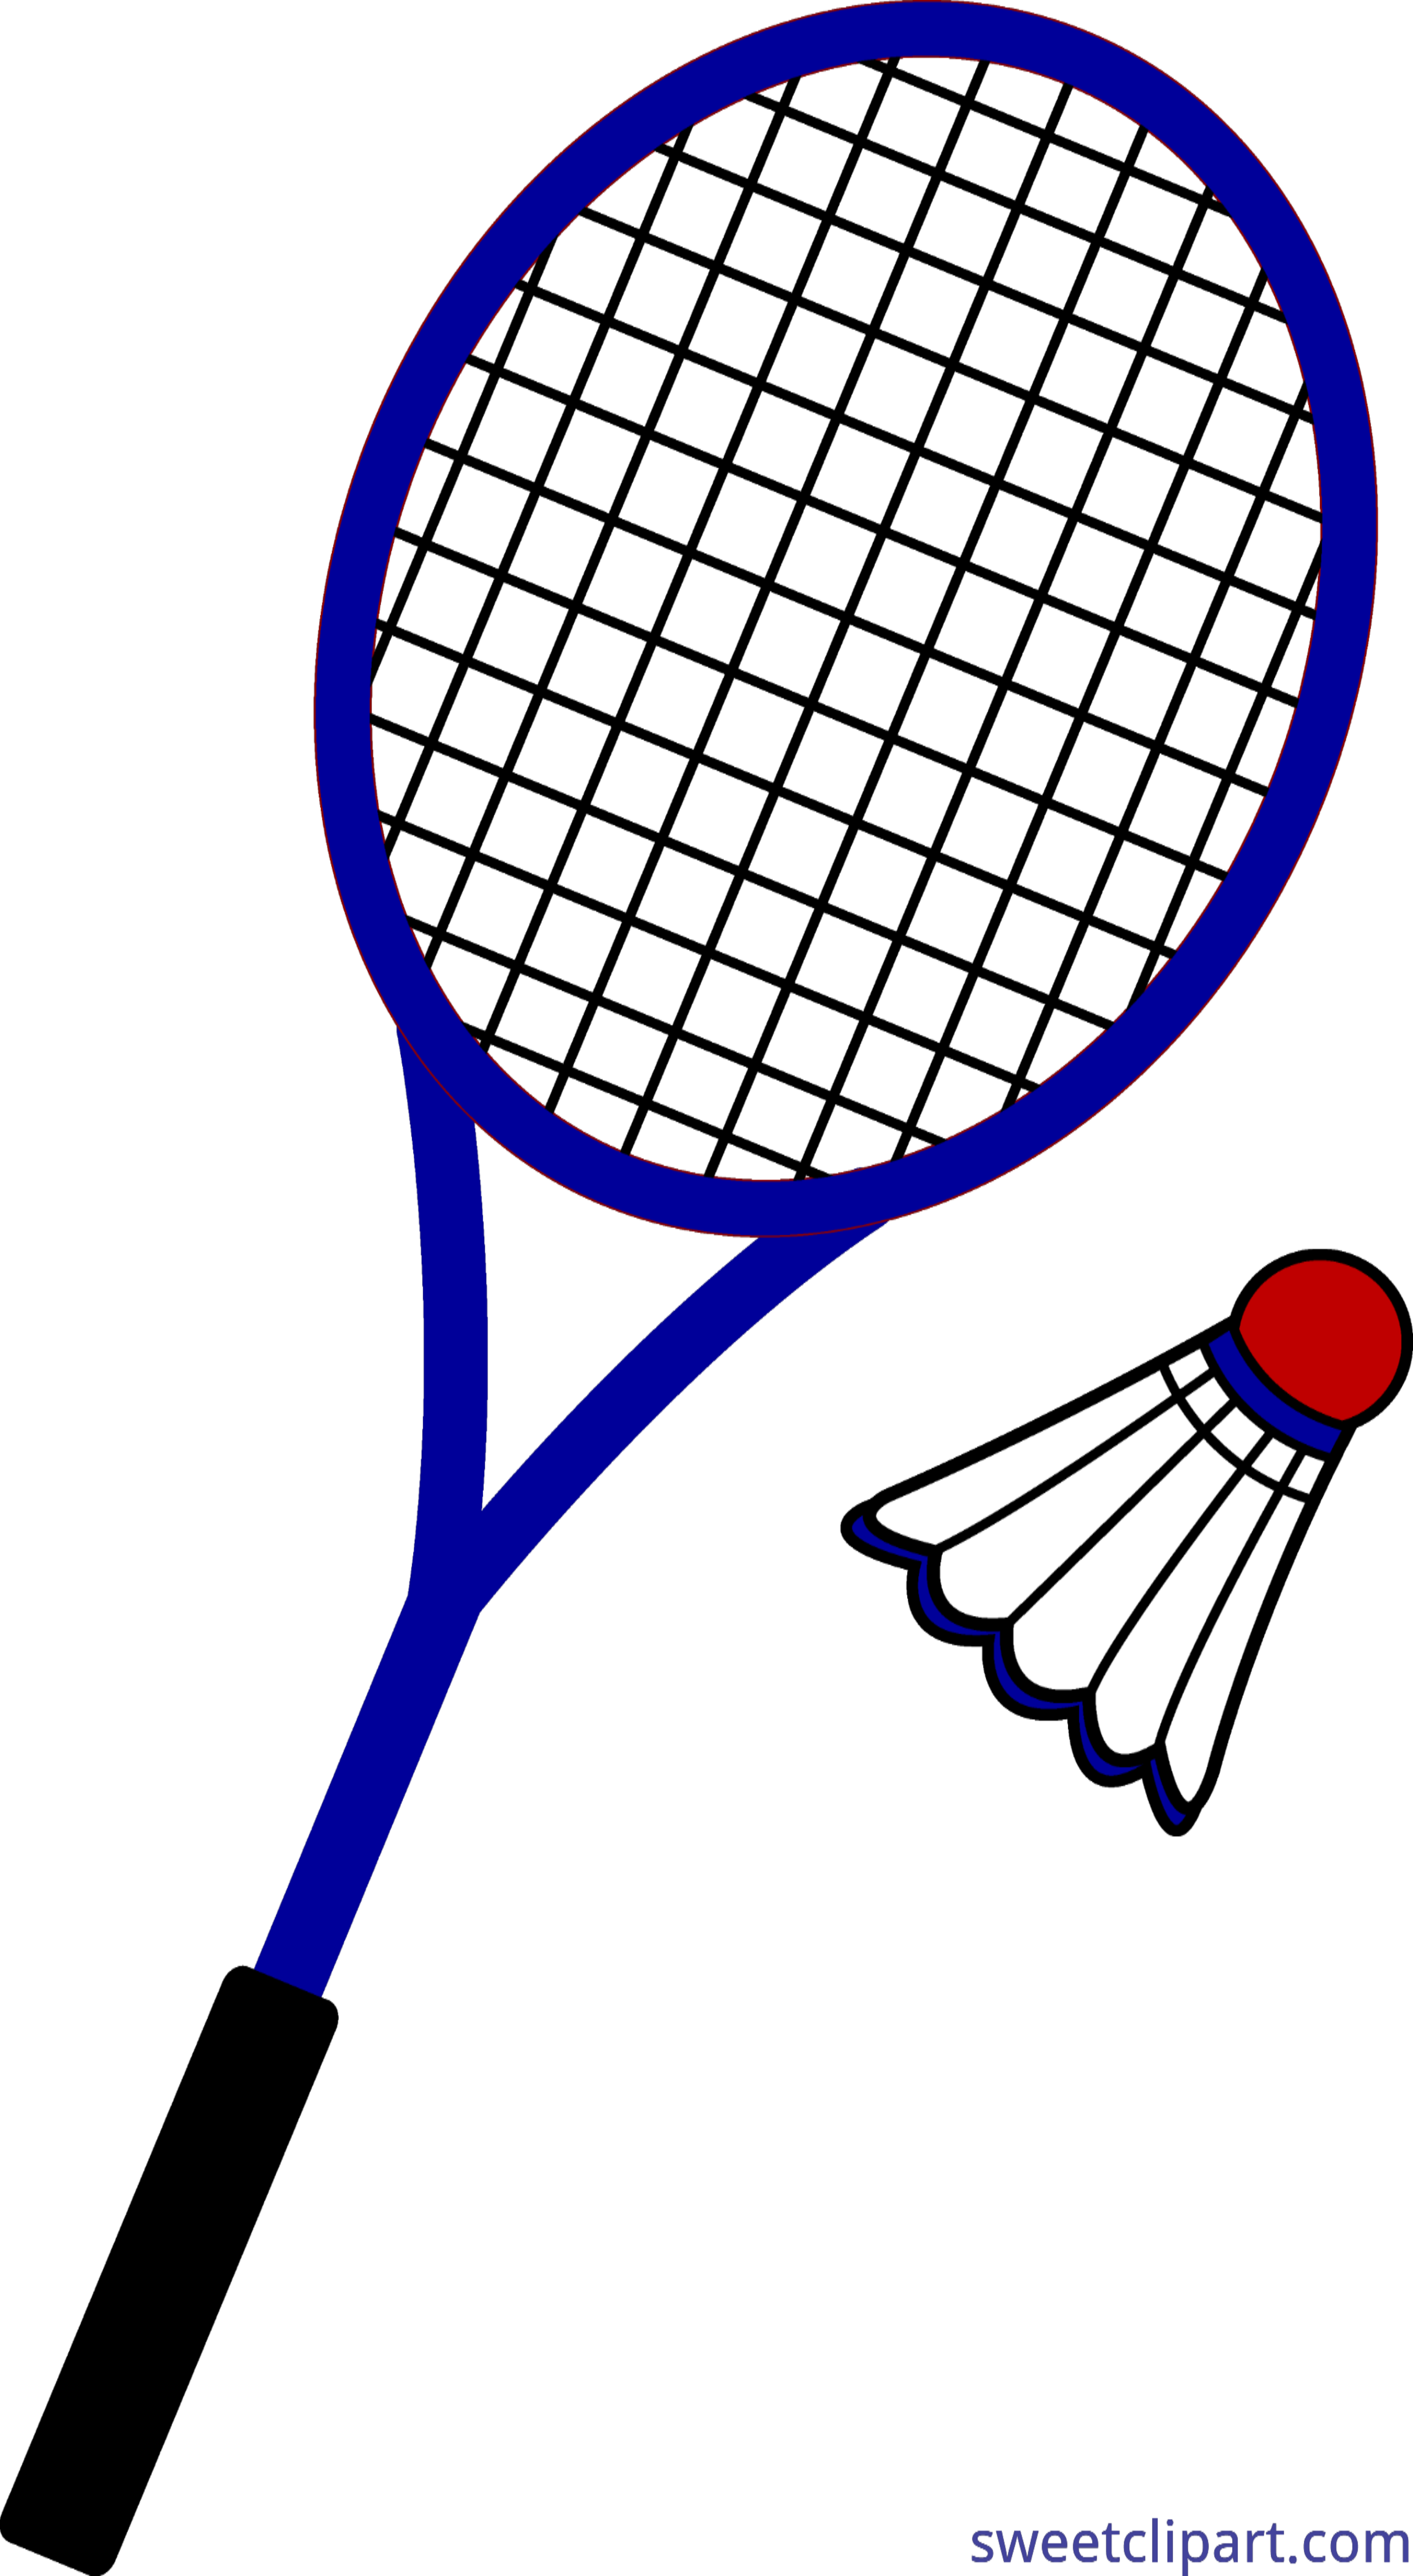 Badmiton clipart black and white stock Badminton Clip Art - Sweet Clip Art black and white stock